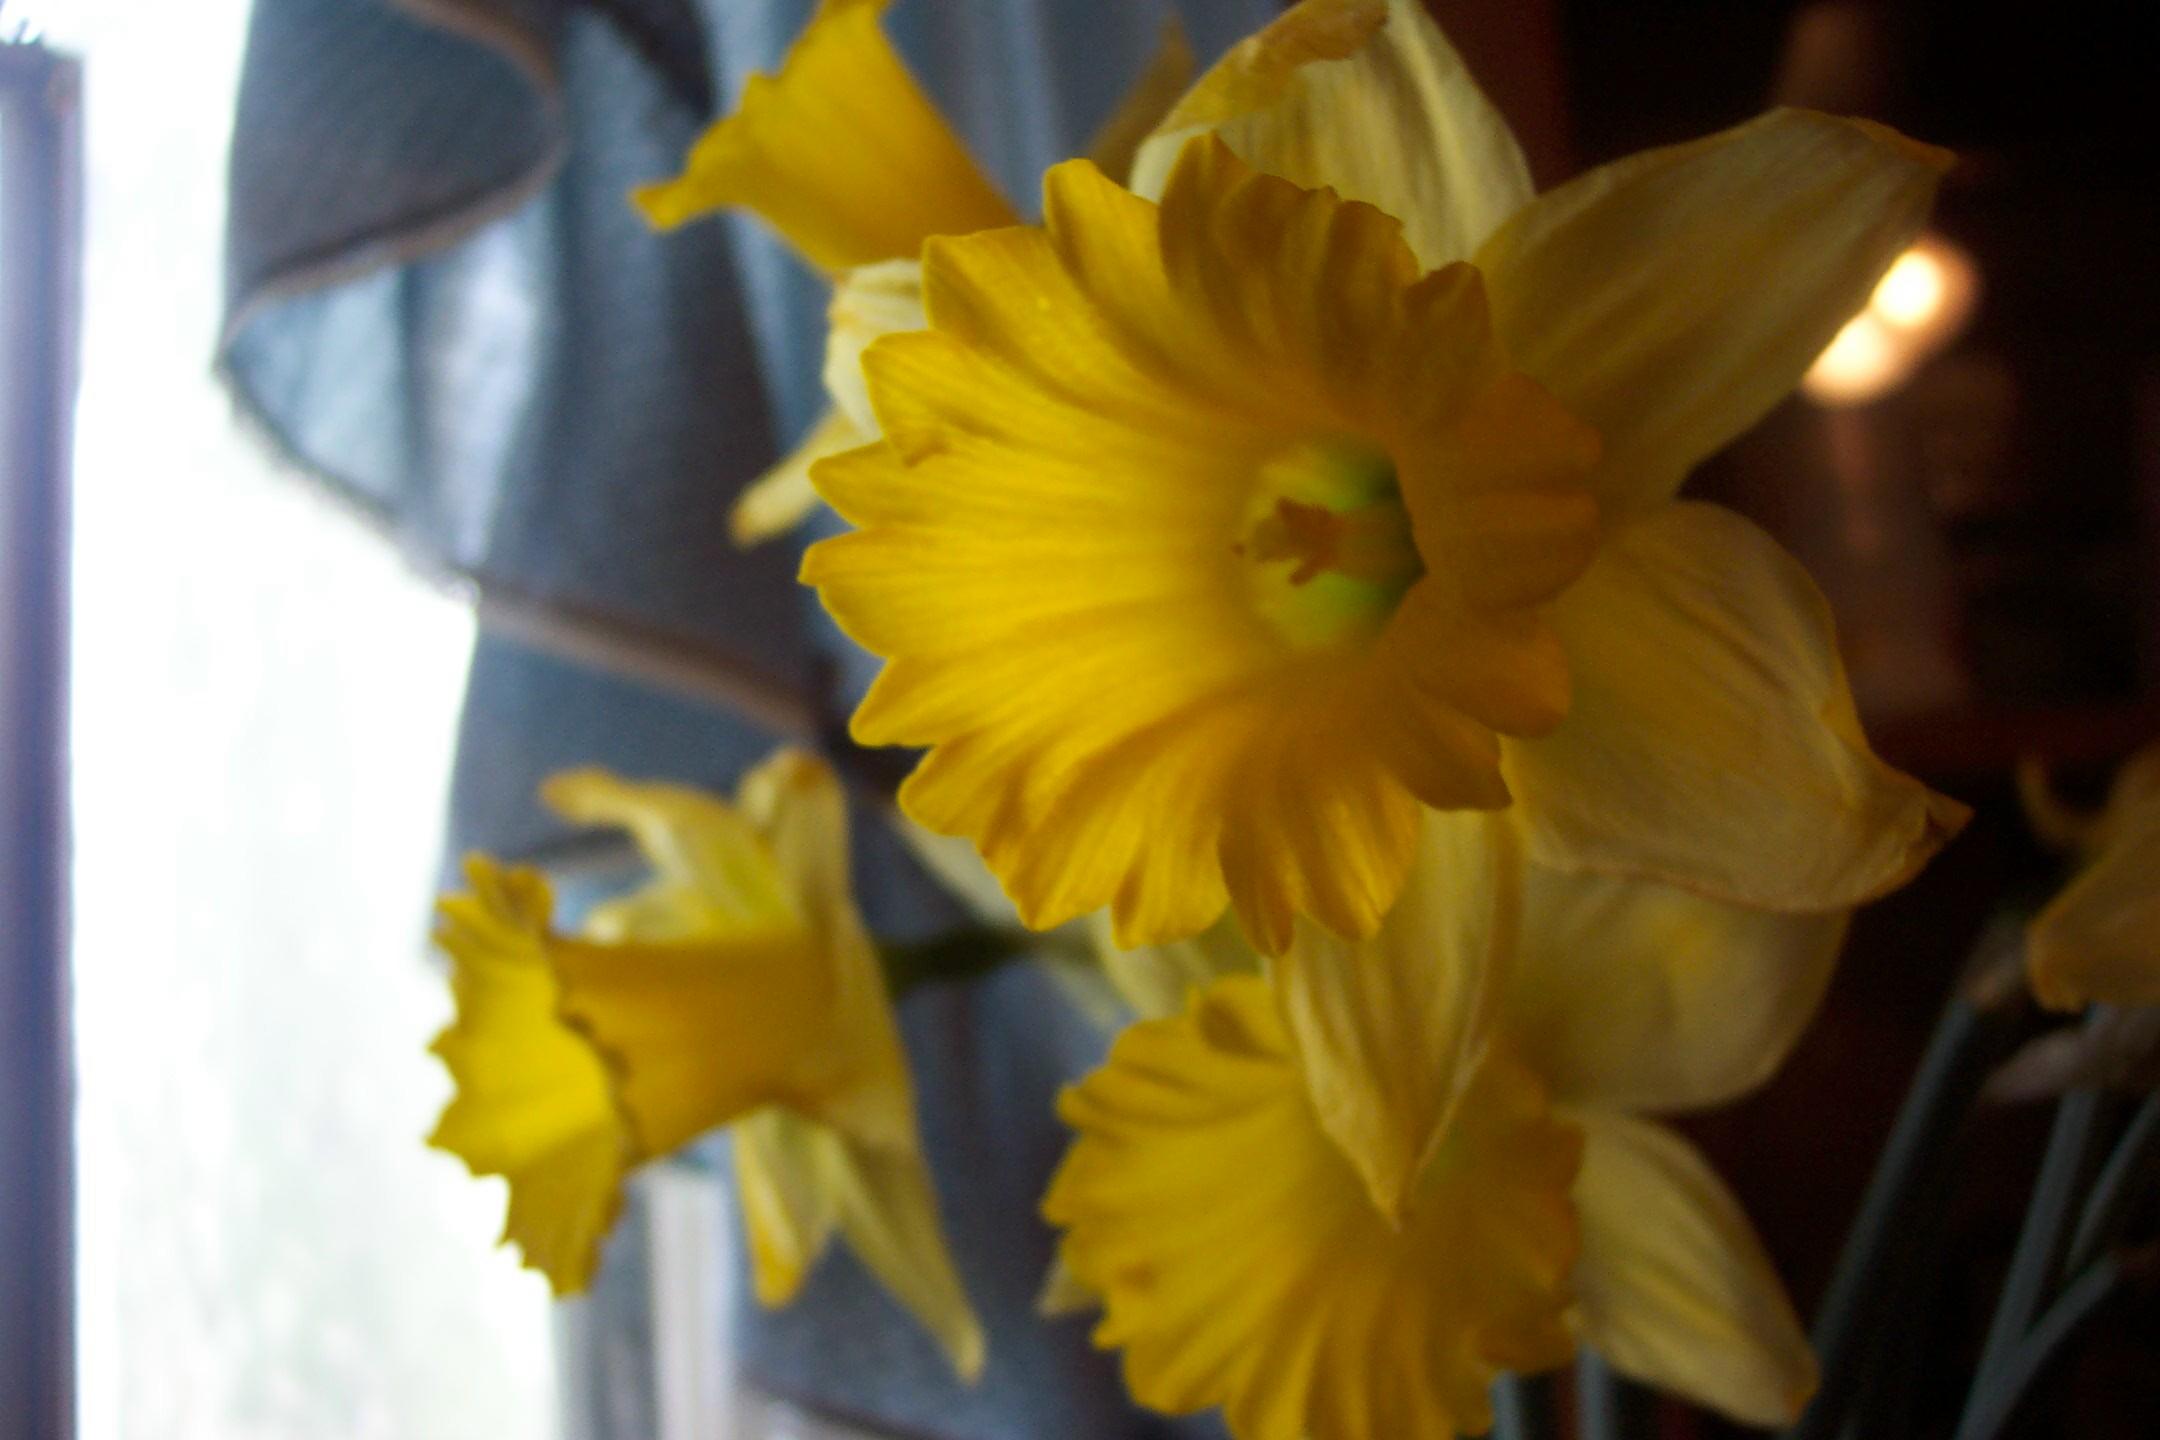 Cellophane Flowers By Moodymona On Deviantart